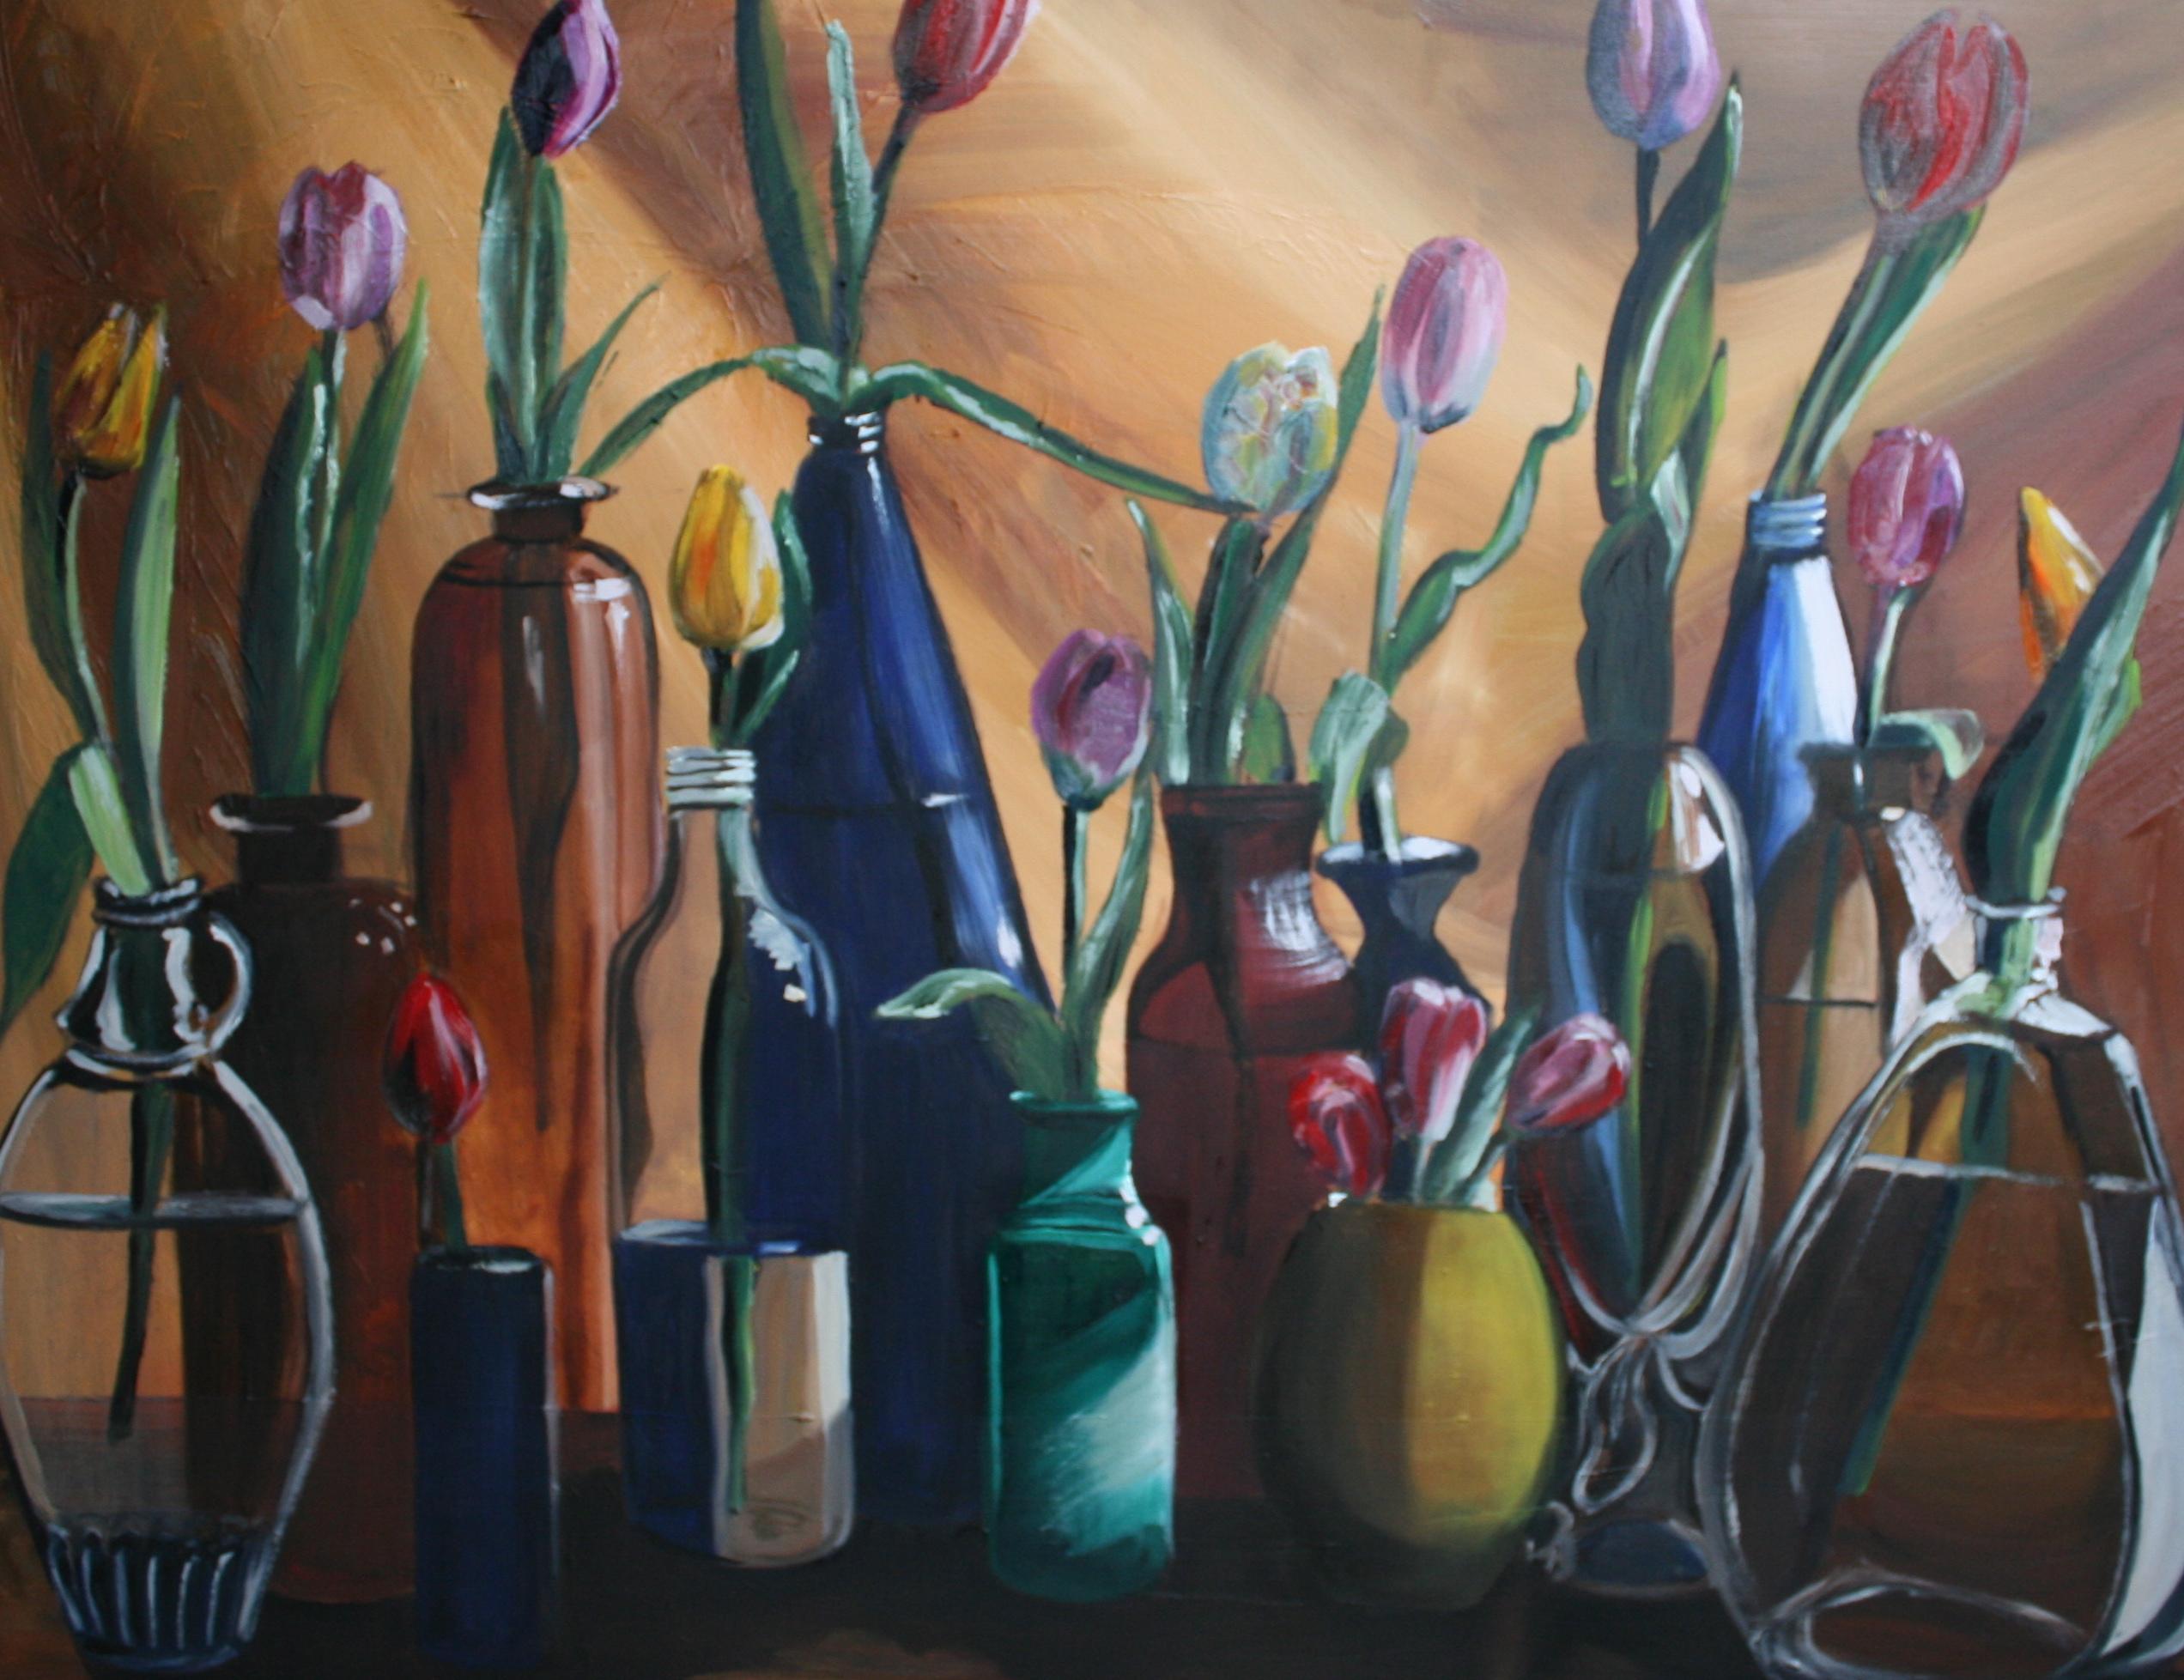 Tulpen in de fles